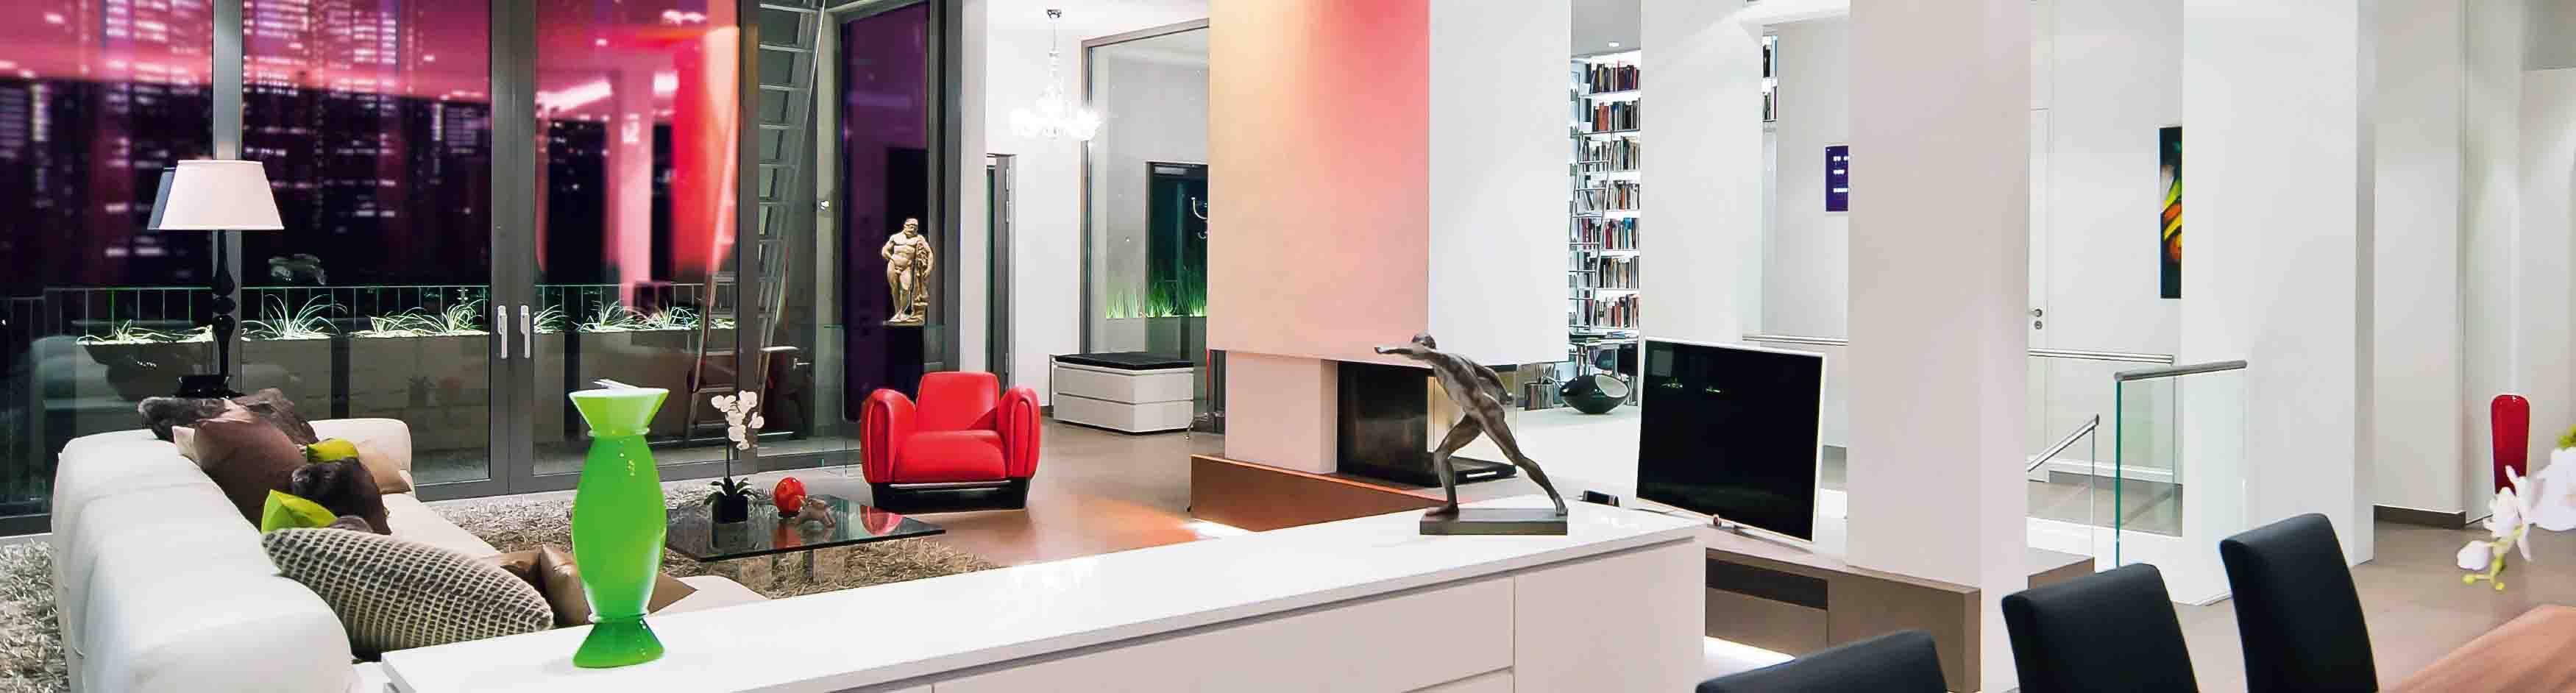 Innenarchitekten Frankfurt kern design innenarchitektur frankfurt penthouse in